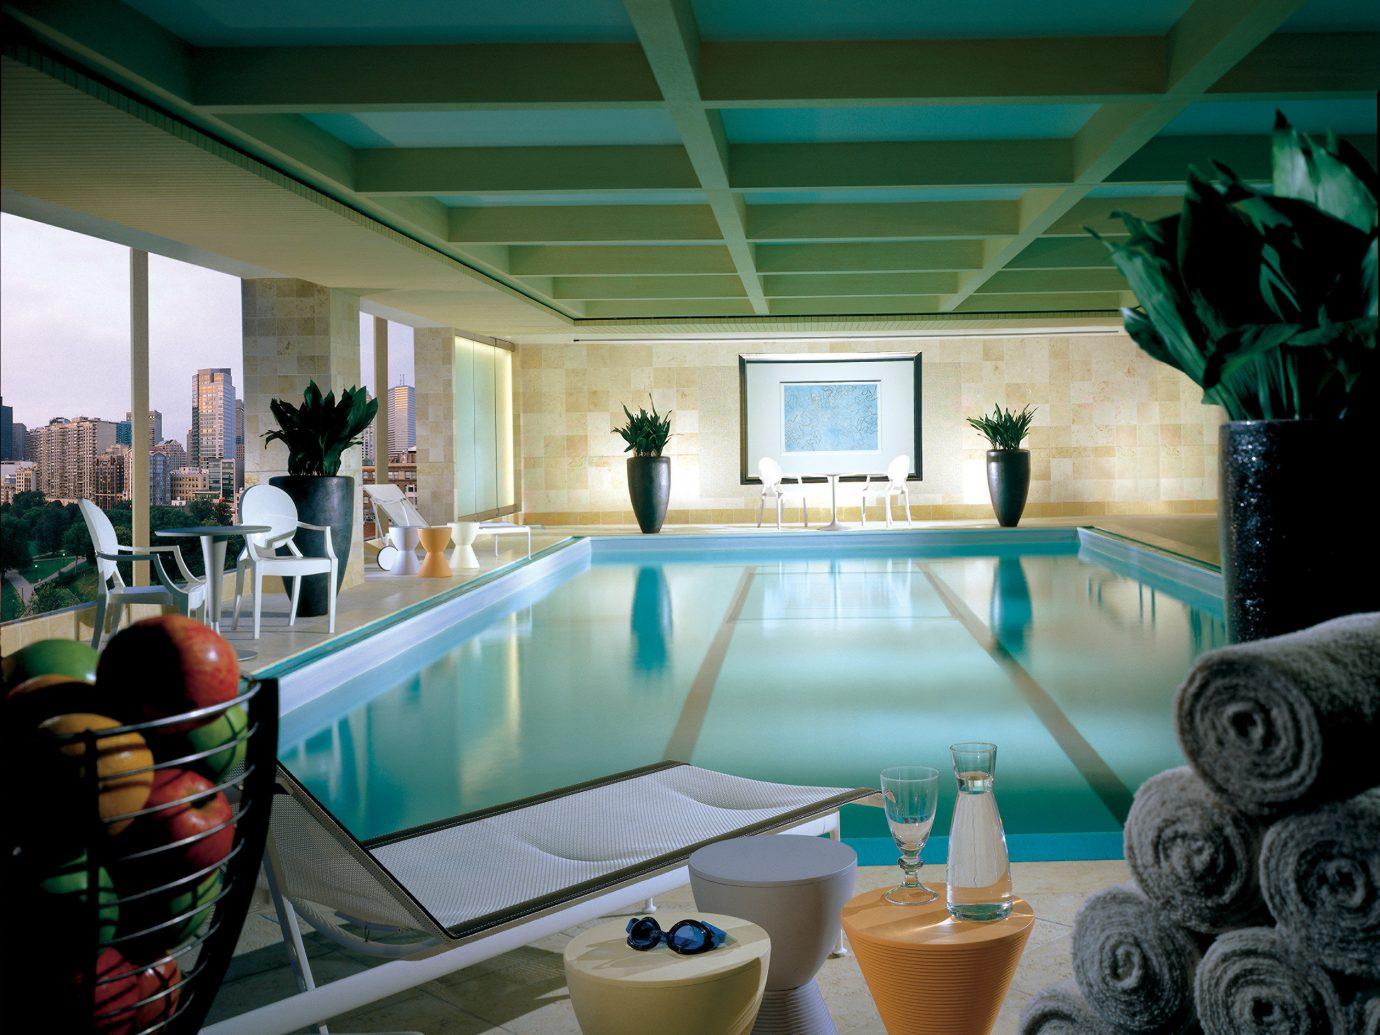 City Elegant Hotels Lounge Luxury Patio Pool Scenic views indoor green swimming pool leisure room estate interior design Design Resort